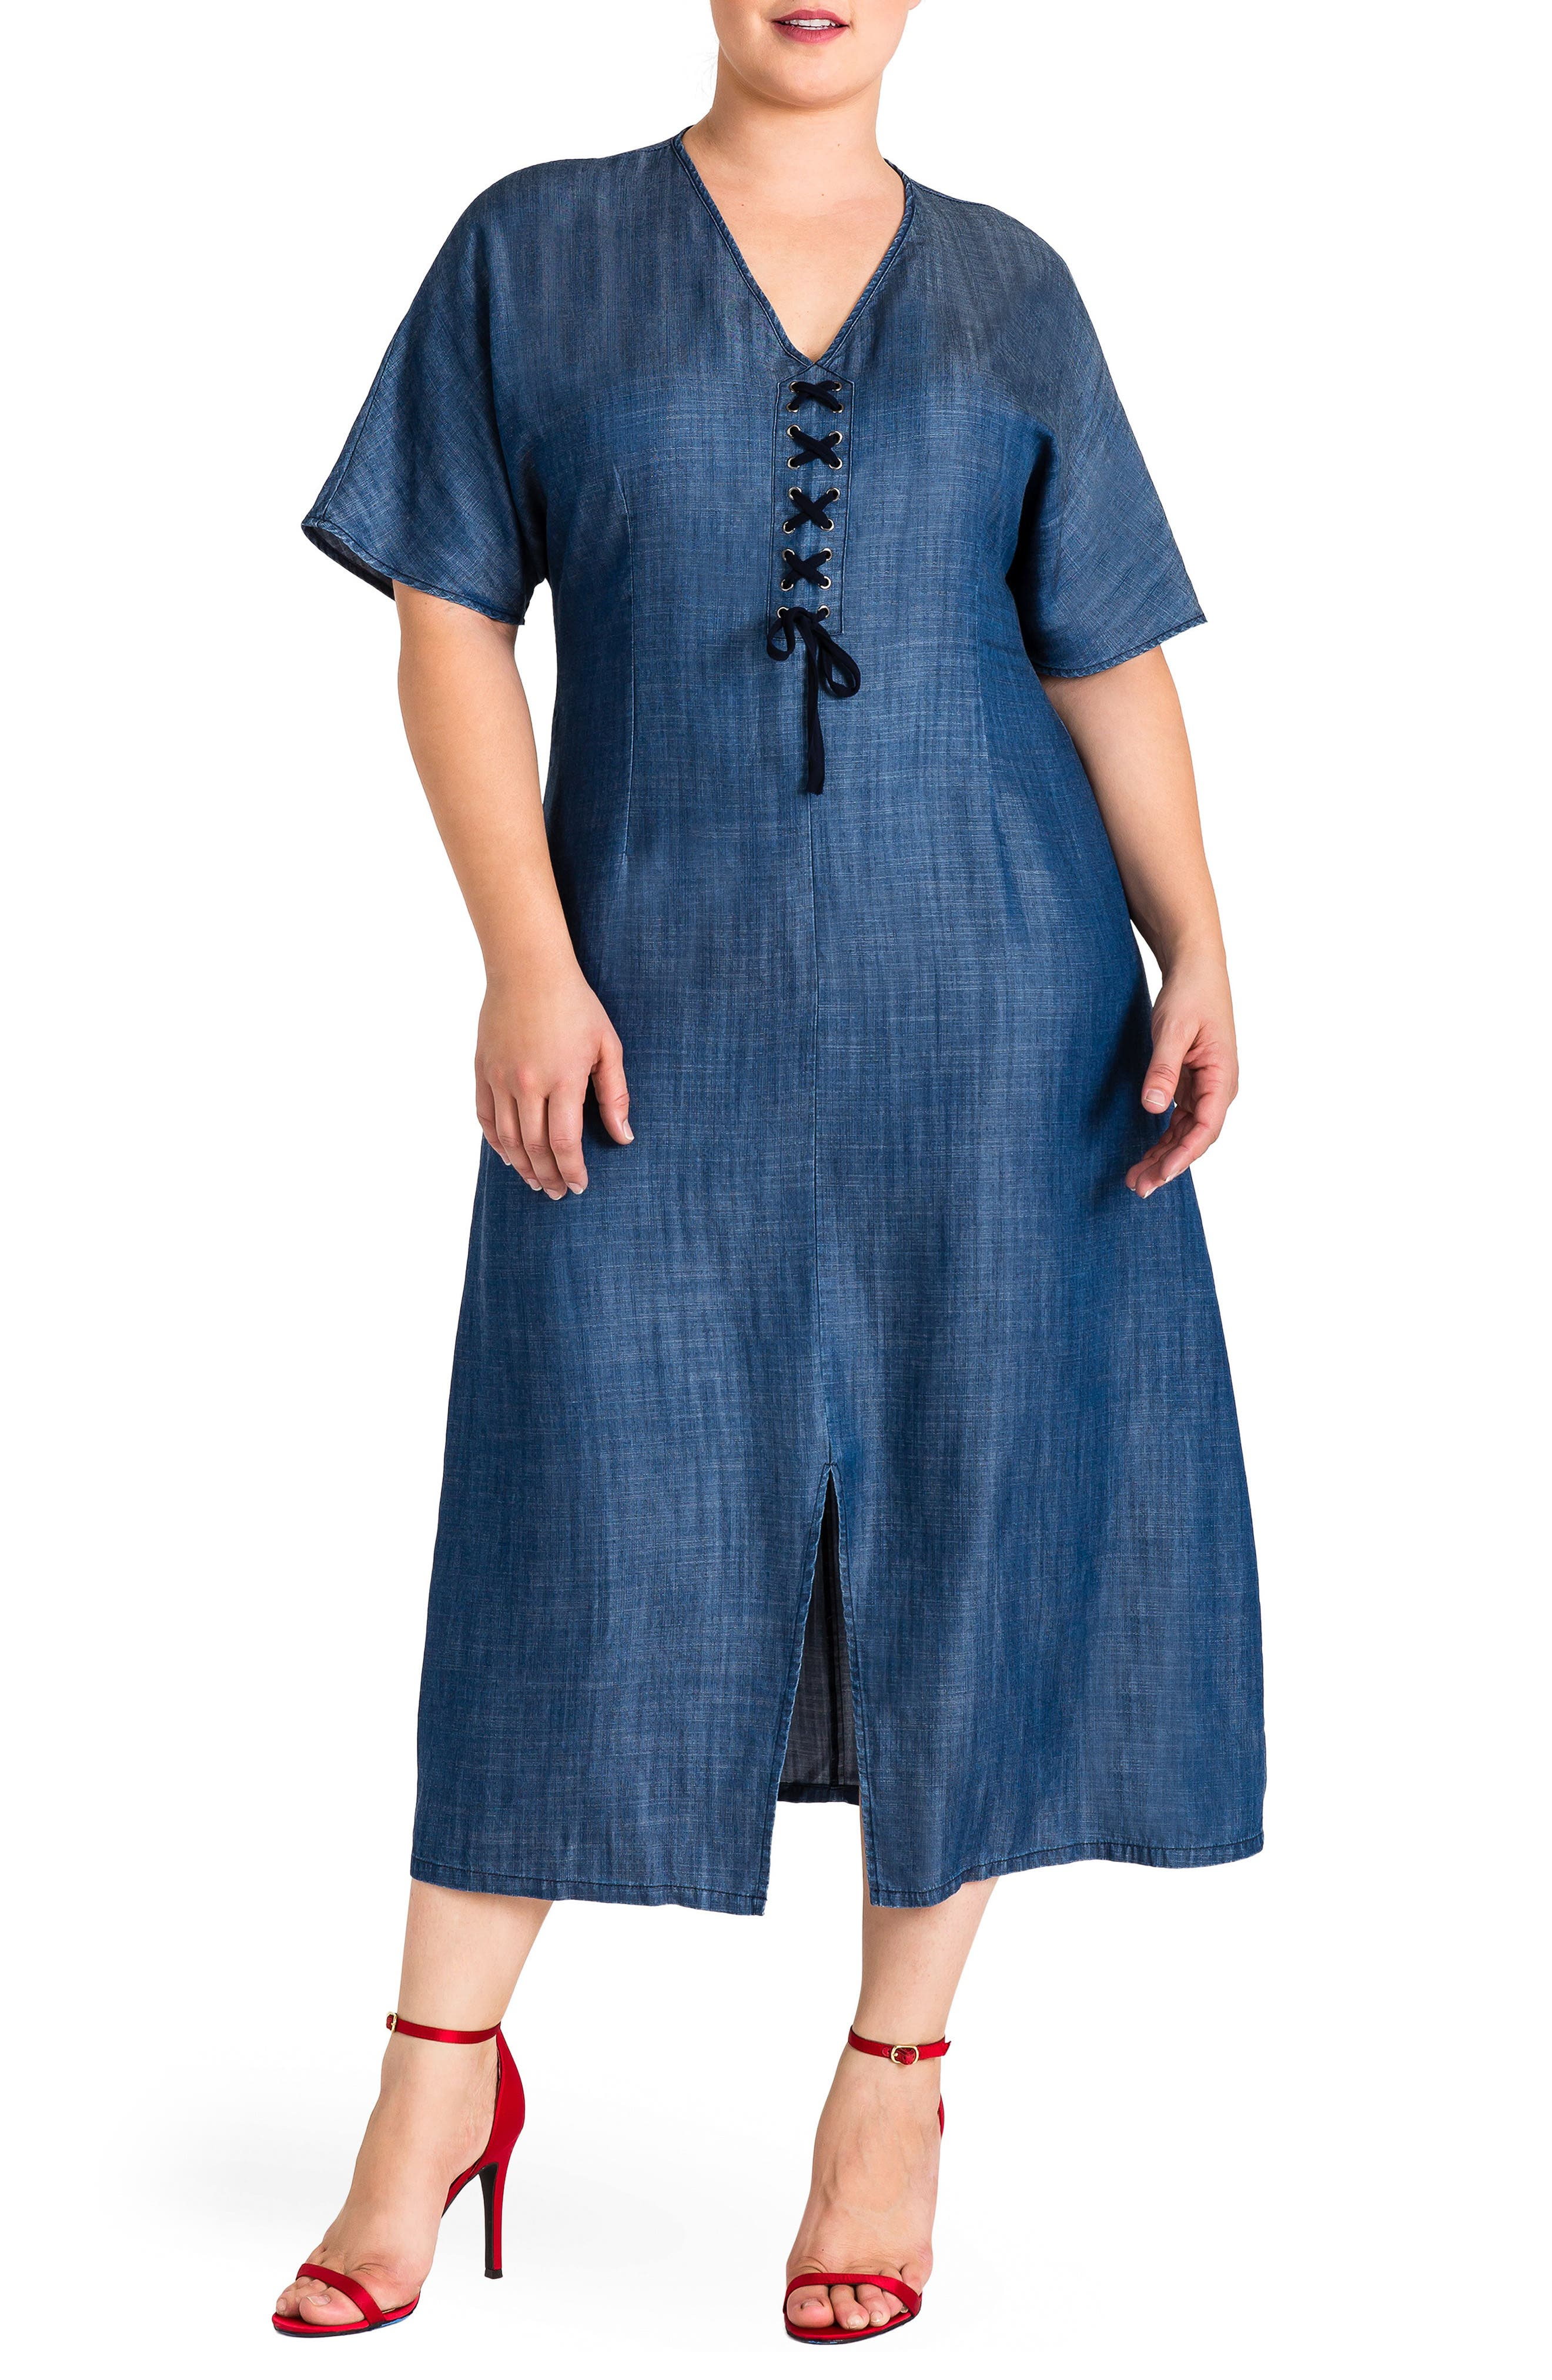 Standard & Practices Meme Tencel Midi Dress,                             Main thumbnail 1, color,                             NAVY